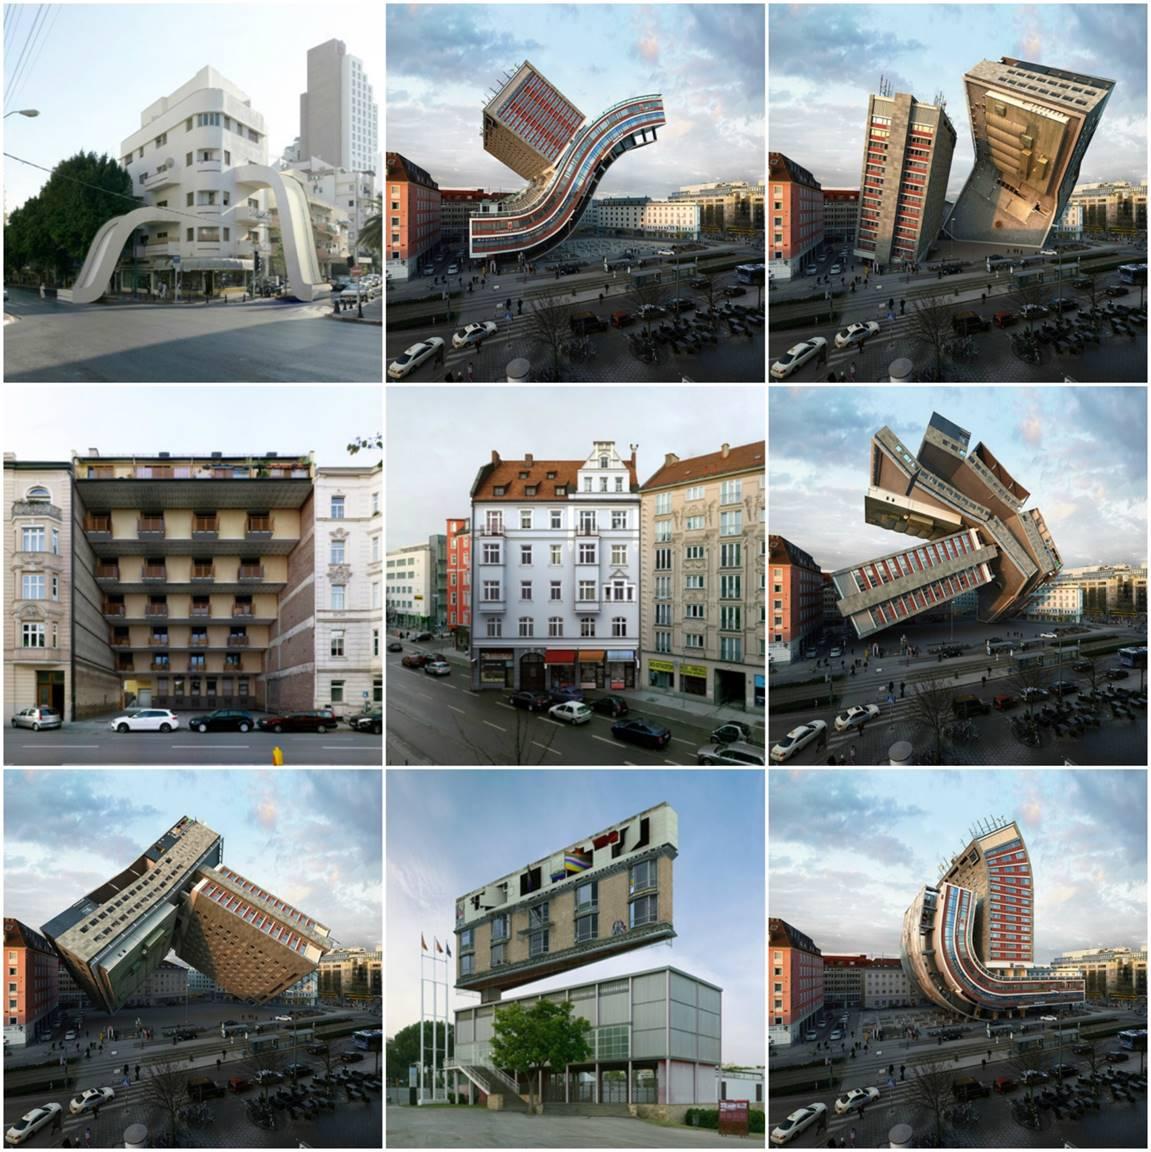 Victor Enrich collage